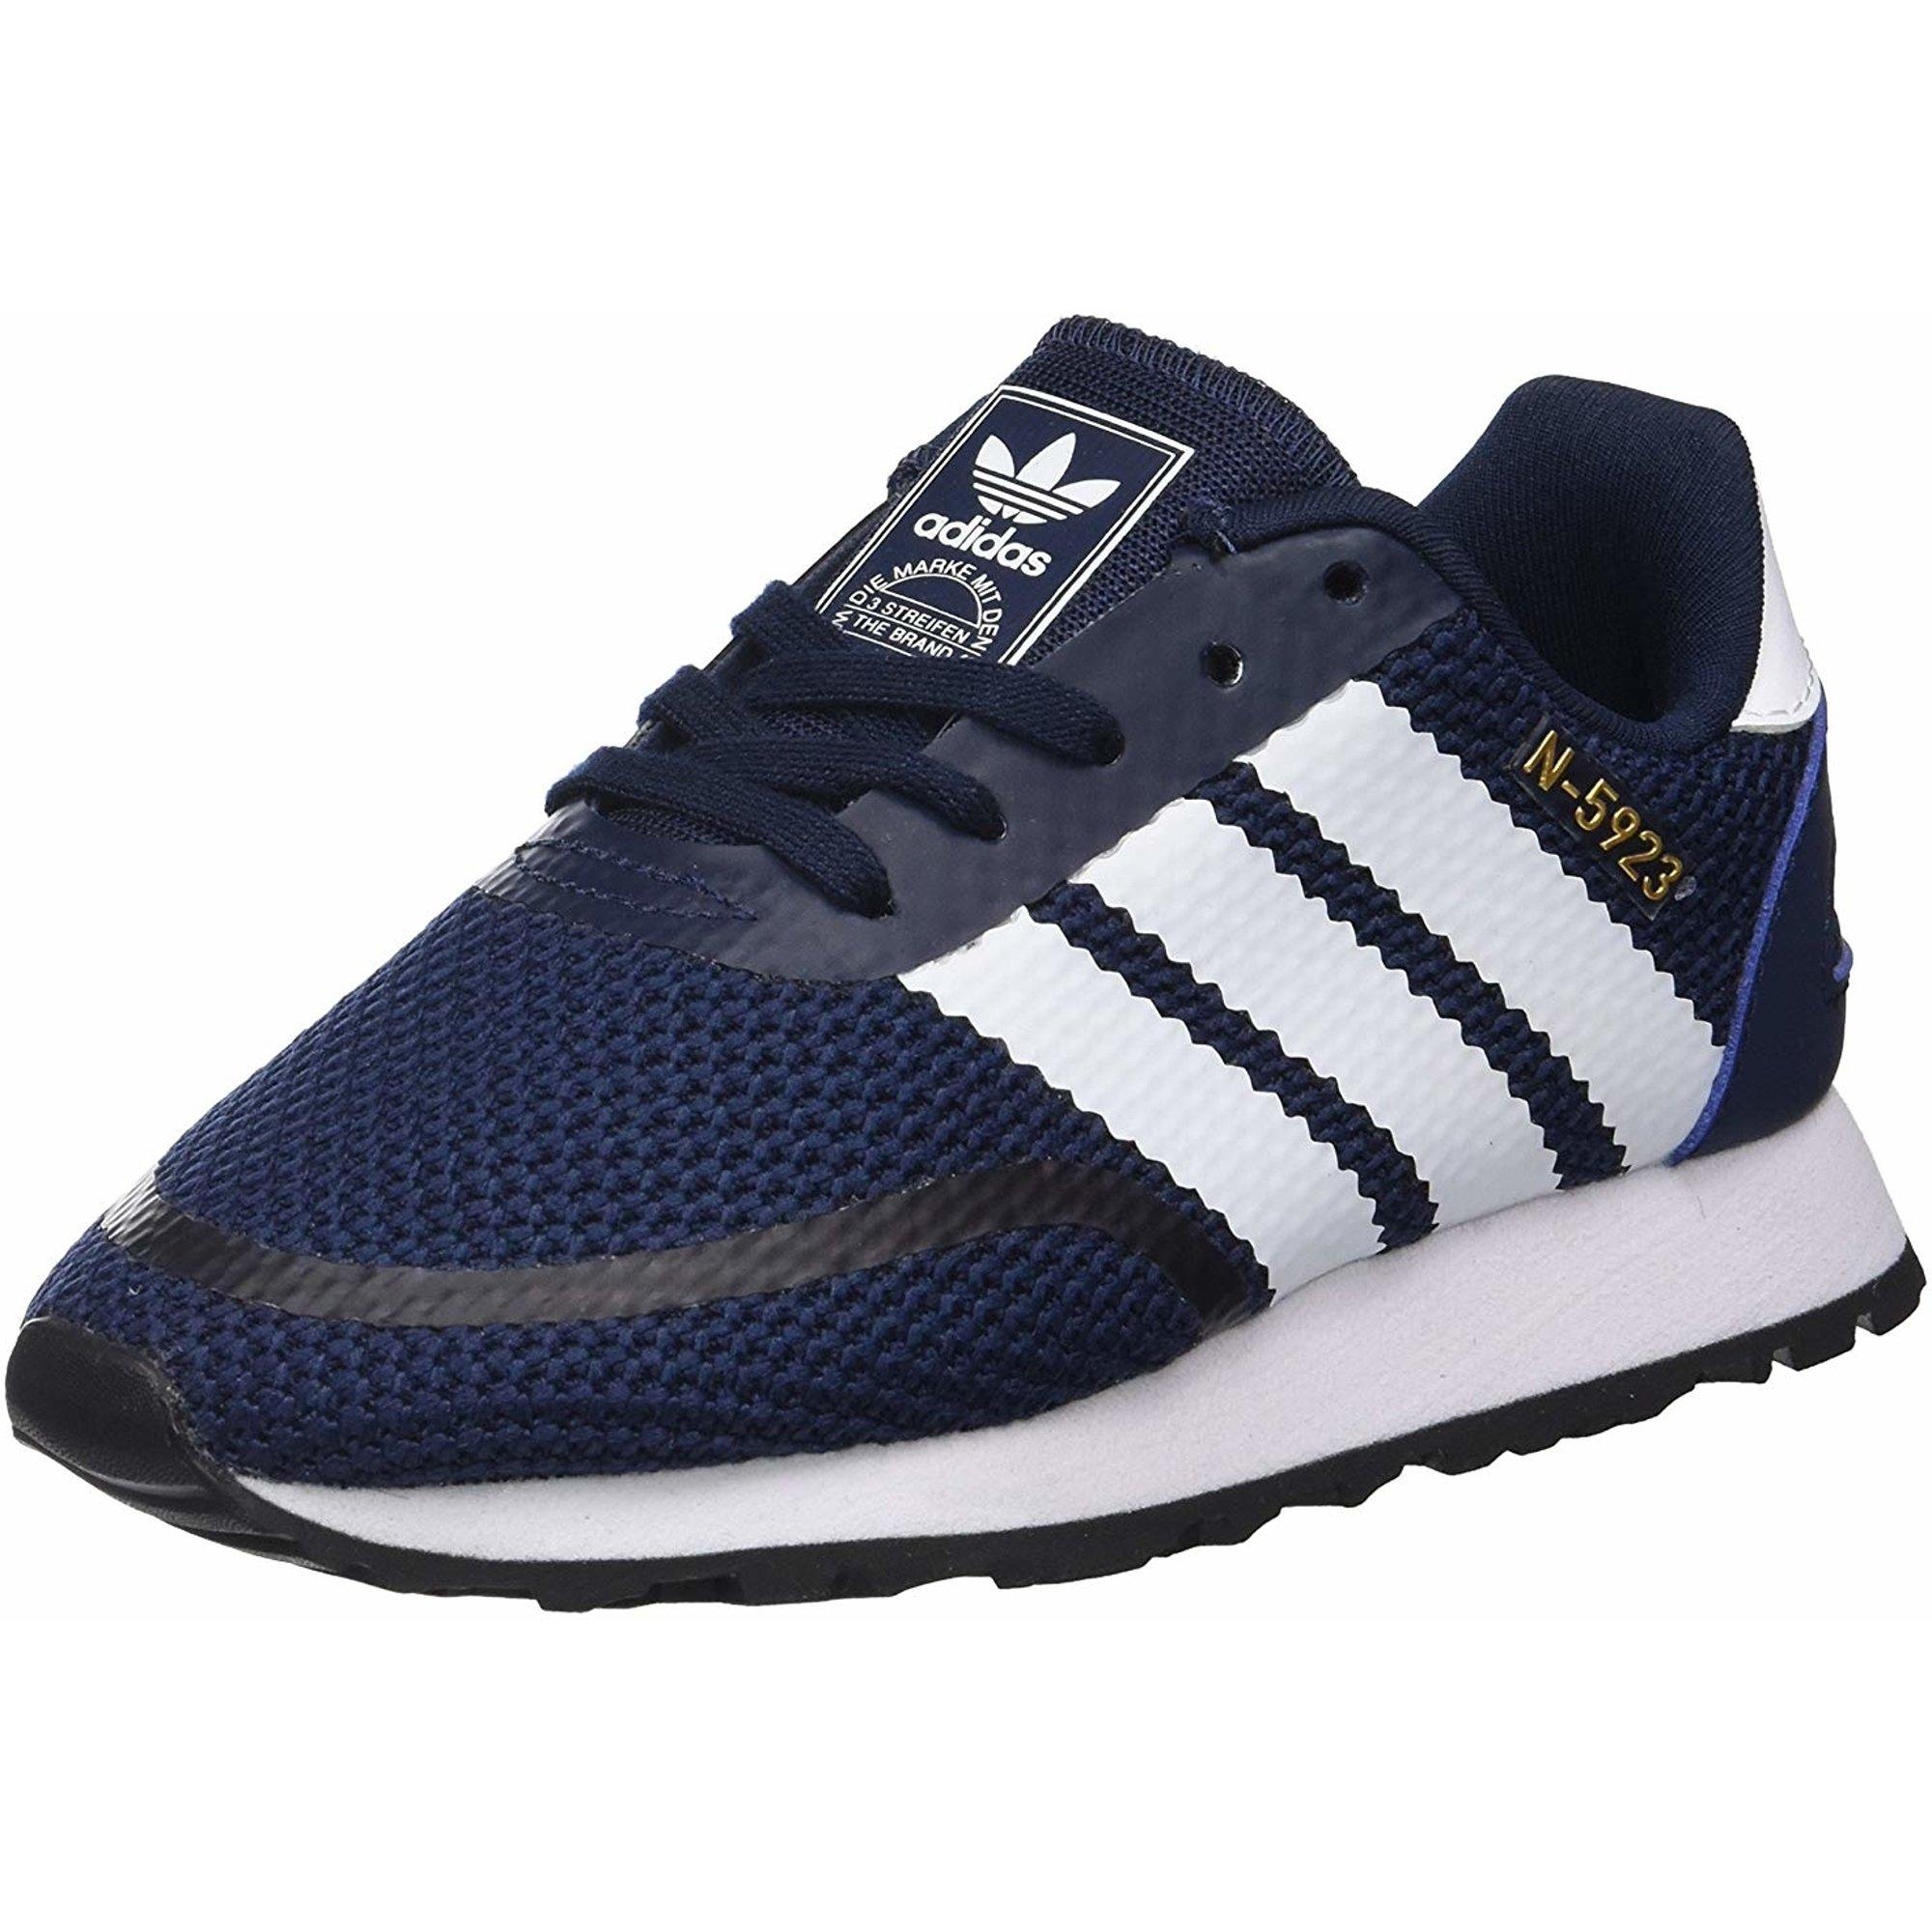 adidas N 5923 Shoes White | adidas Australia